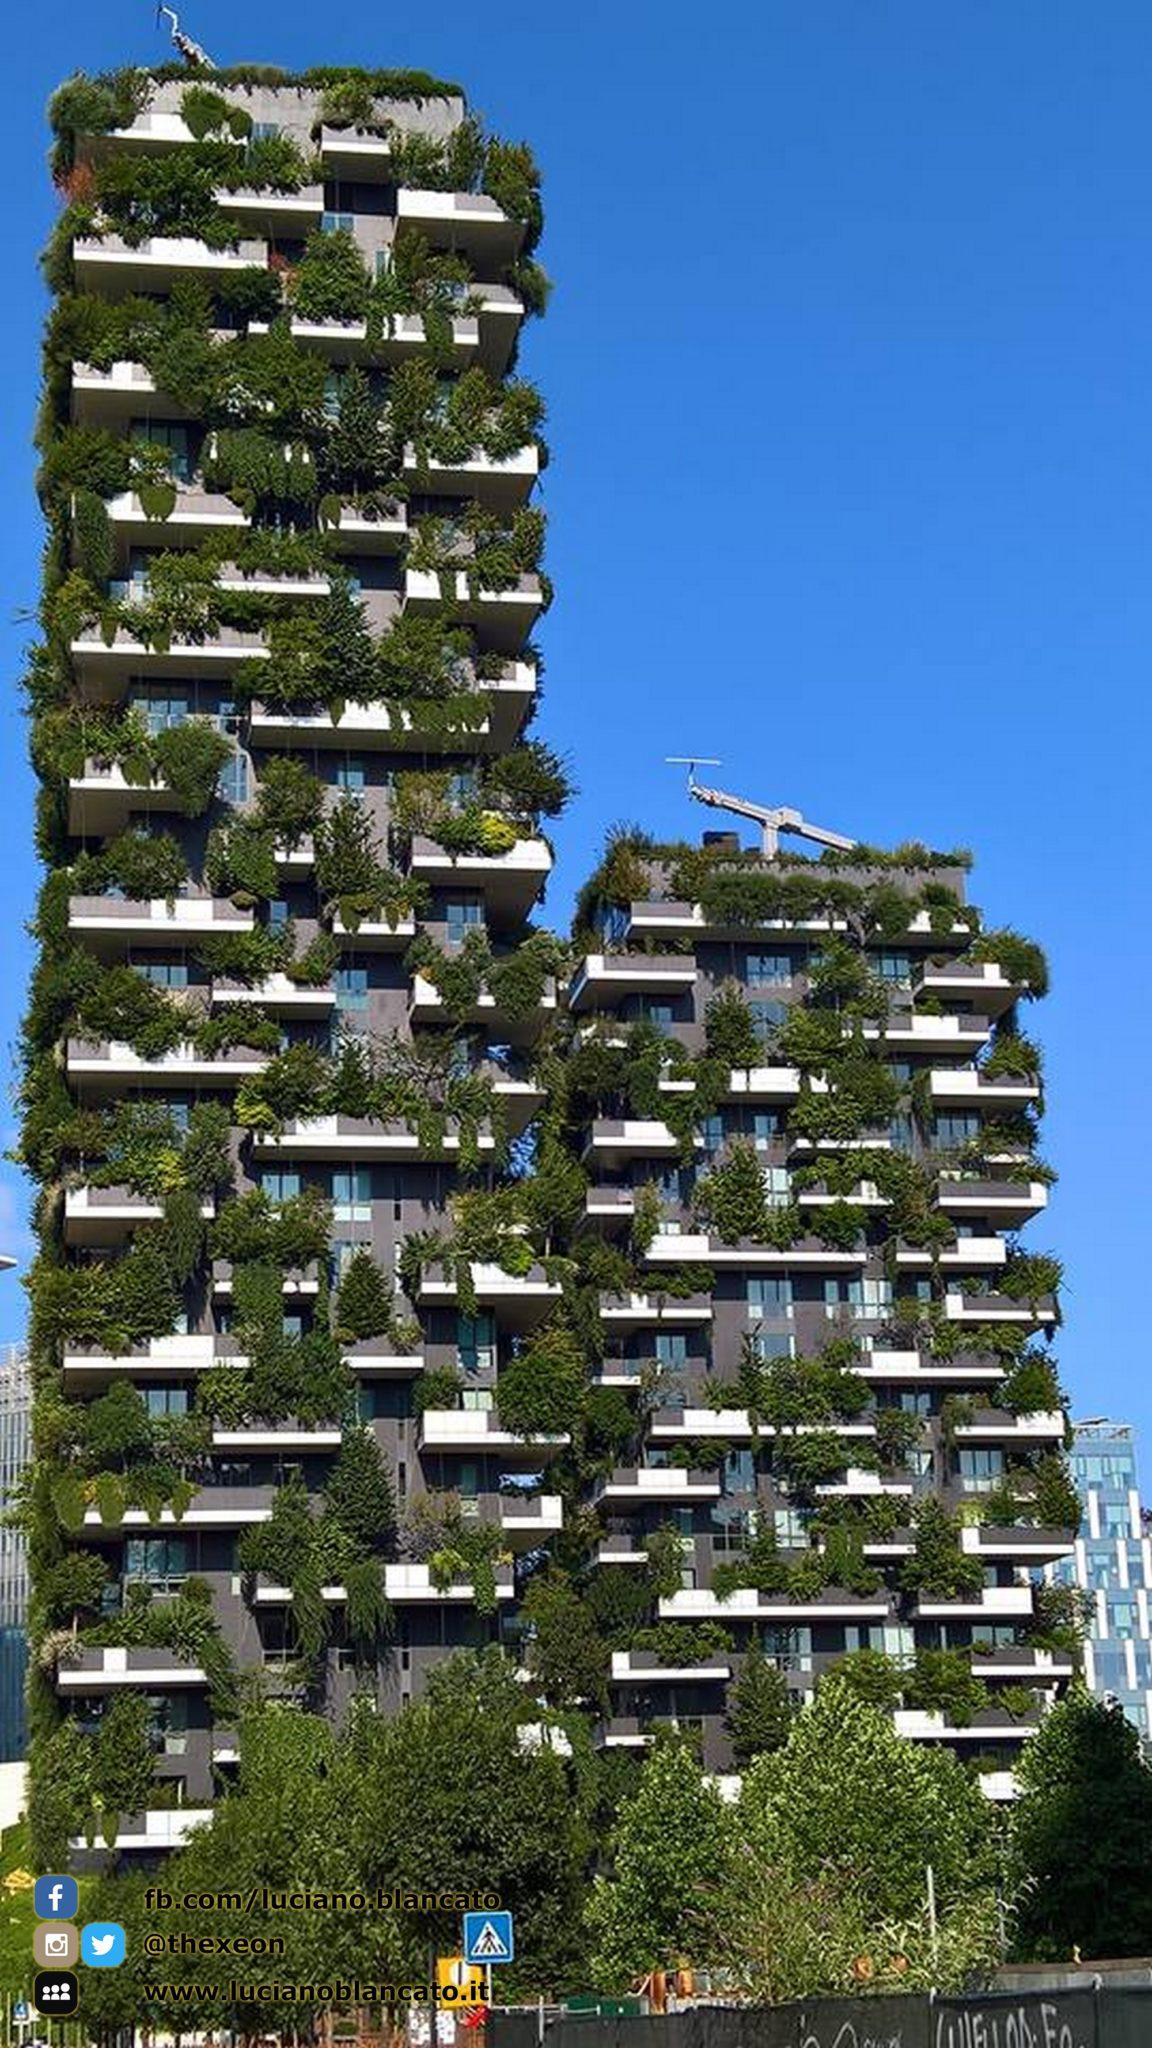 Milano - giardino verticale